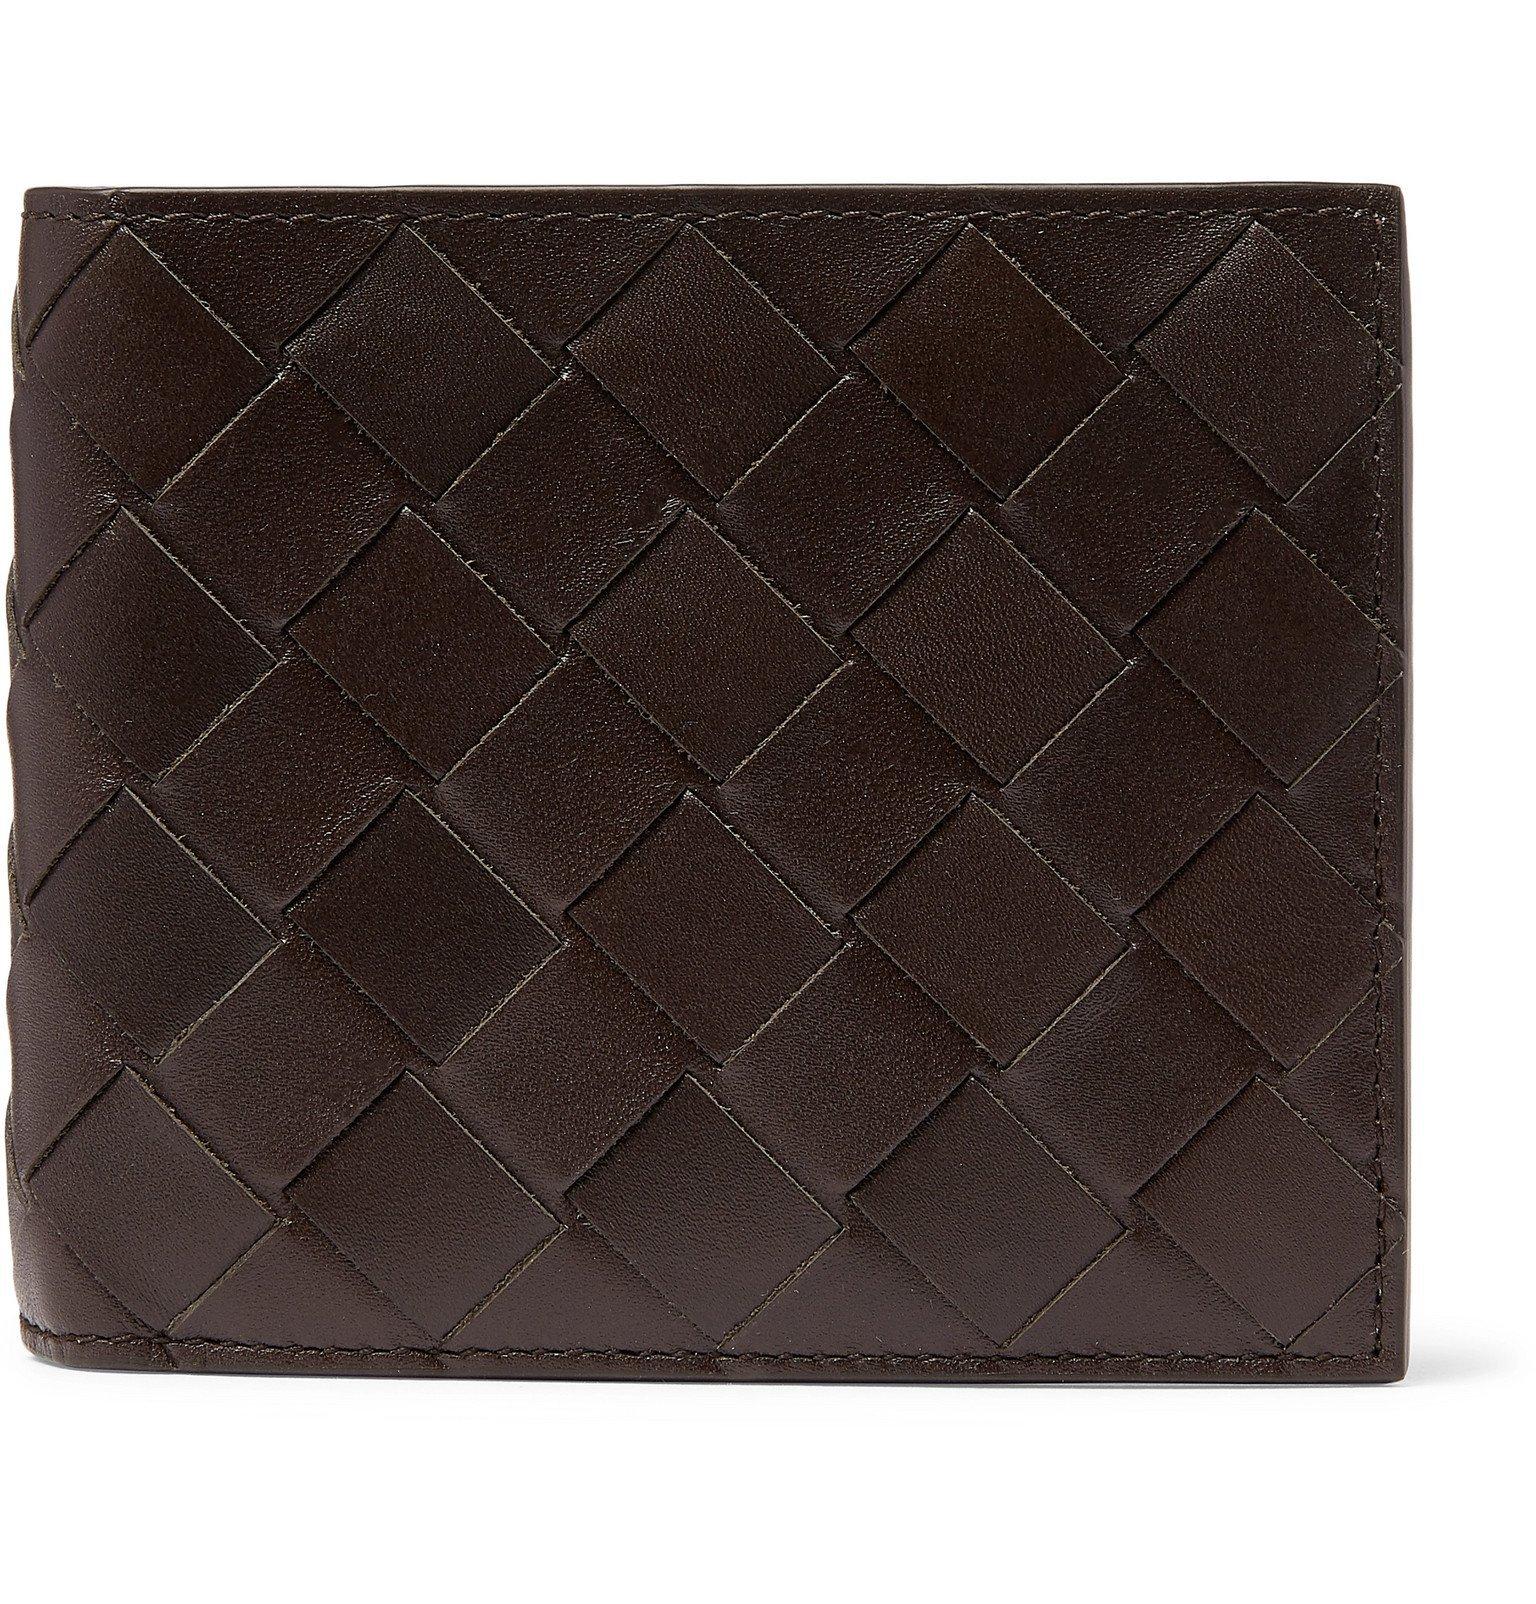 Photo: Bottega Veneta - Intrecciato Leather Billfold Wallet - Brown